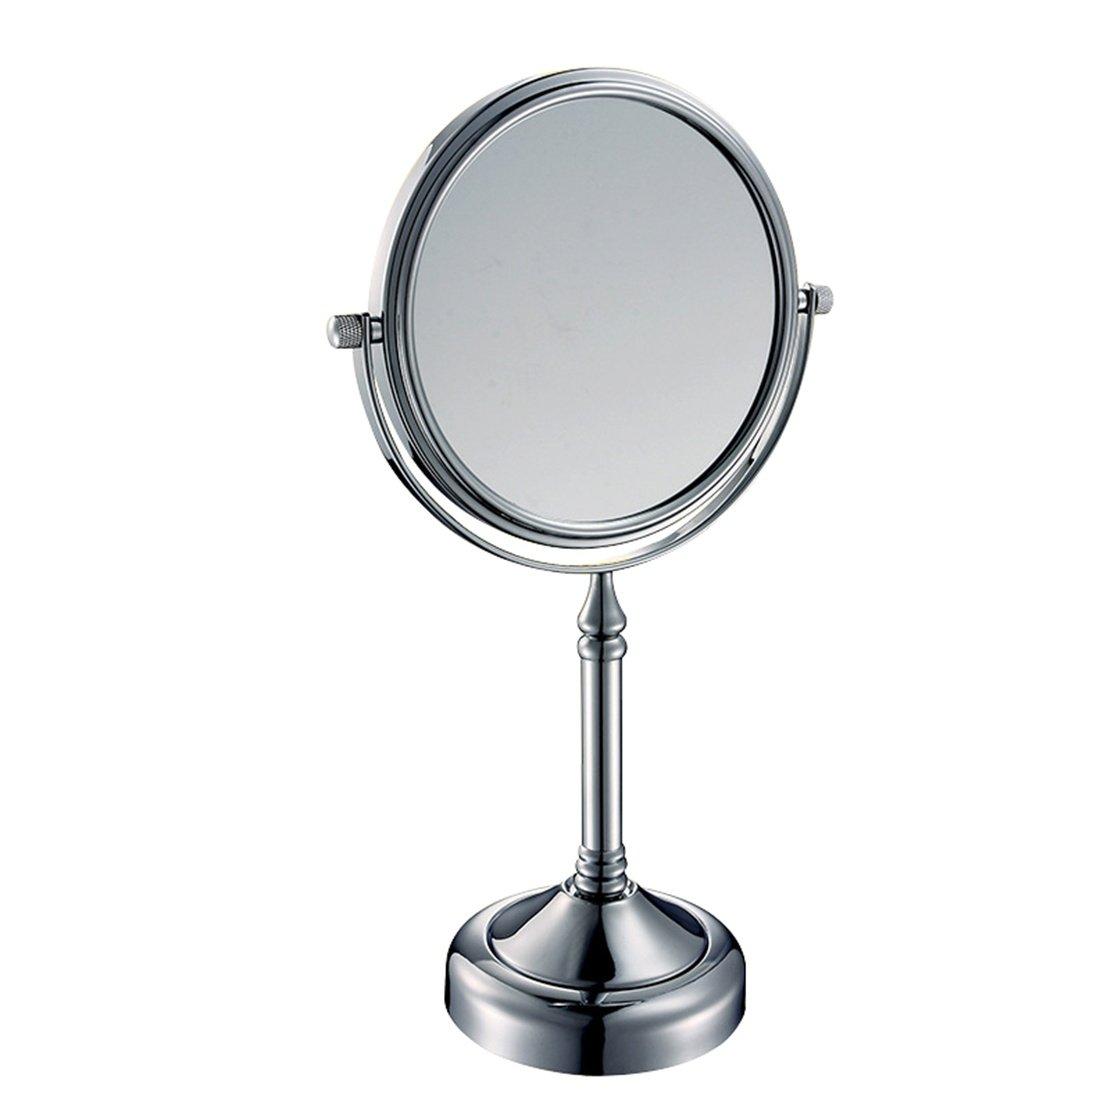 Ysayc 3X Tabletop Makeup Mirror Swivel Beauty 360° Free Rotating Metal Desktop Horizontally Hotel Bathroom Vanity Mirror. Chrome, 8 inch